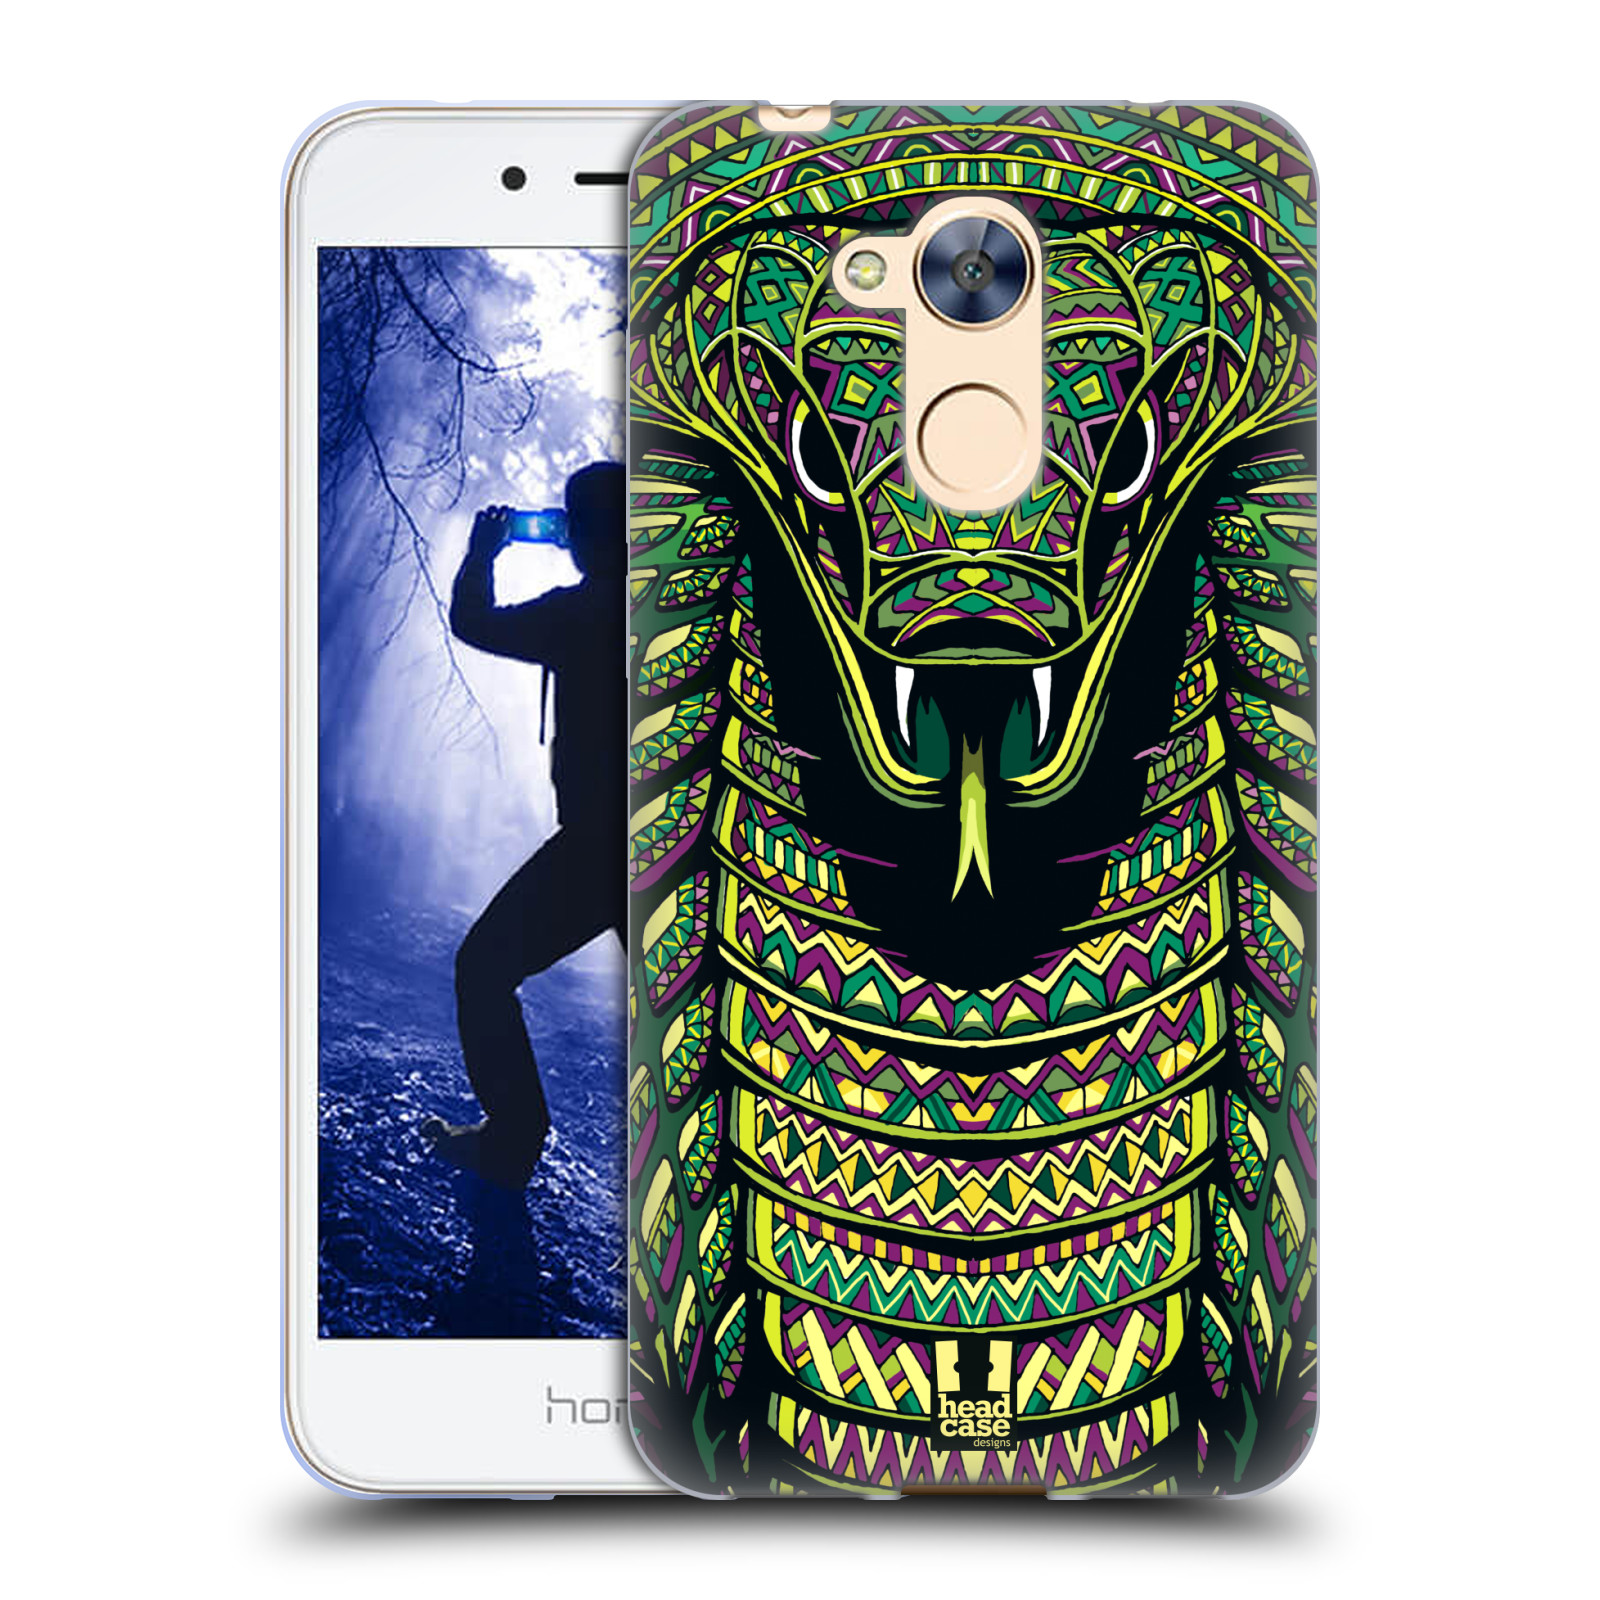 Silikonové pouzdro na mobil Honor 6A - Head Case - AZTEC HAD